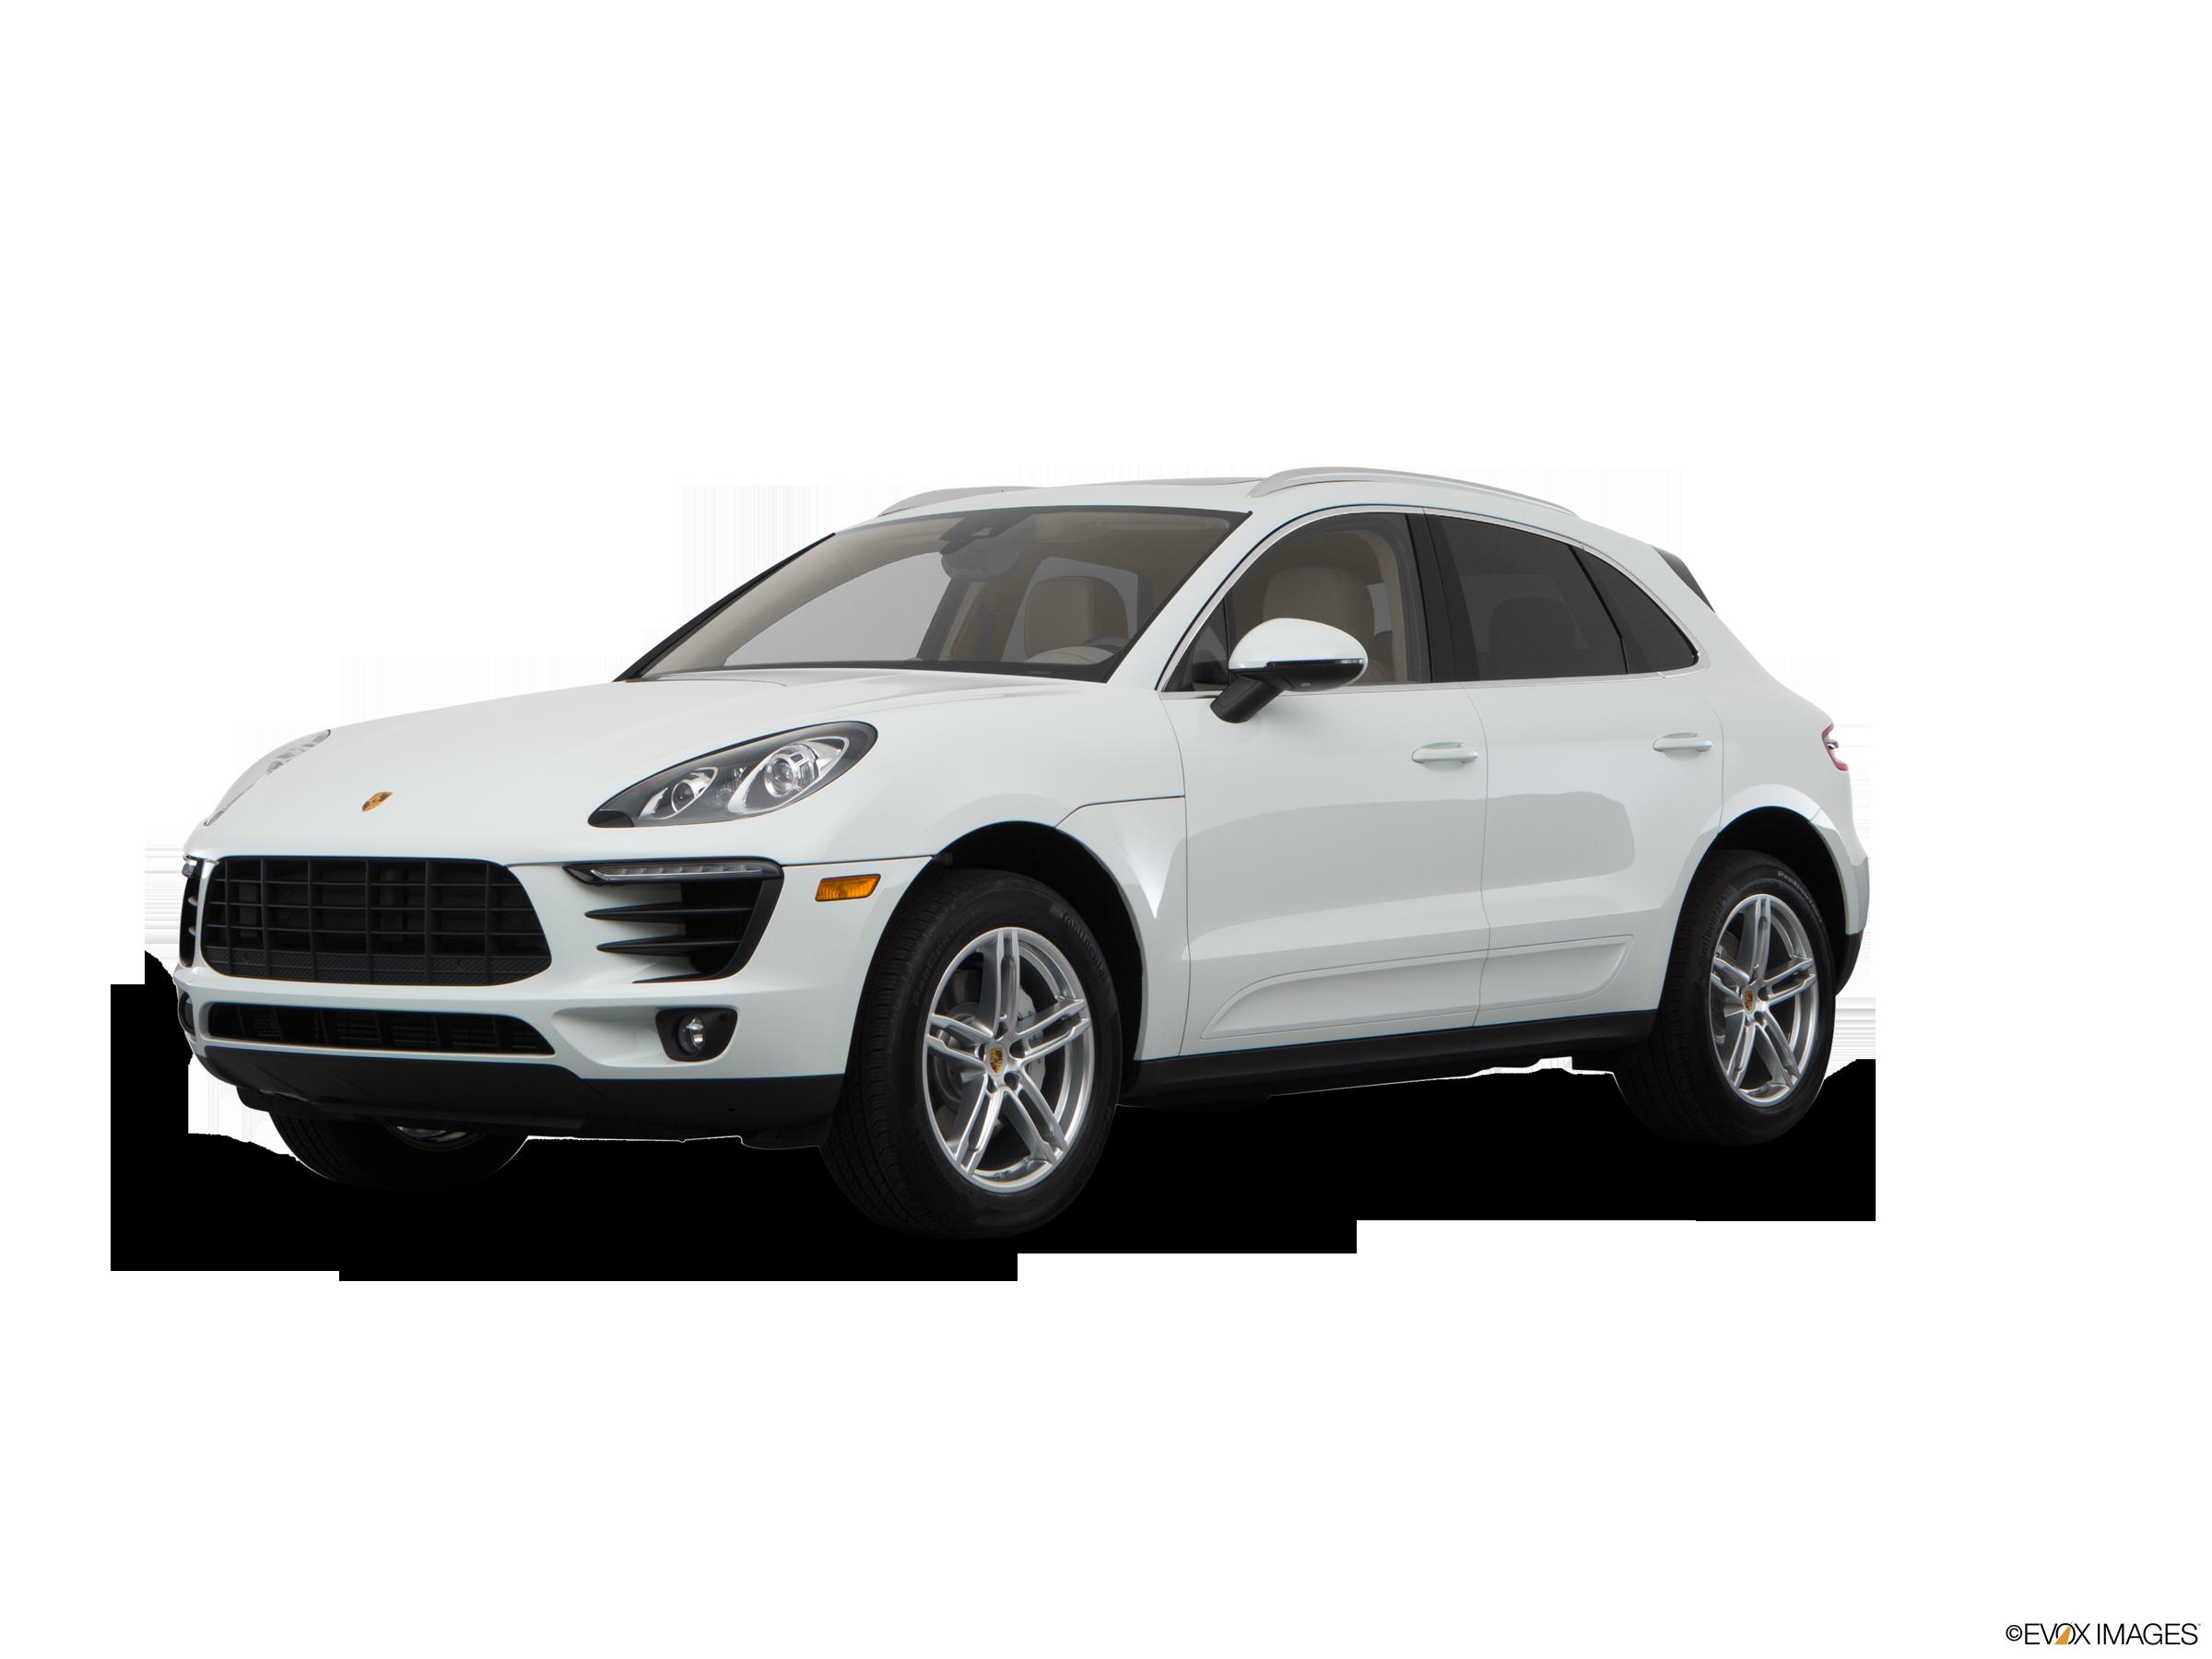 2018 Porsche Macan Pricing, Reviews \u0026 Ratings